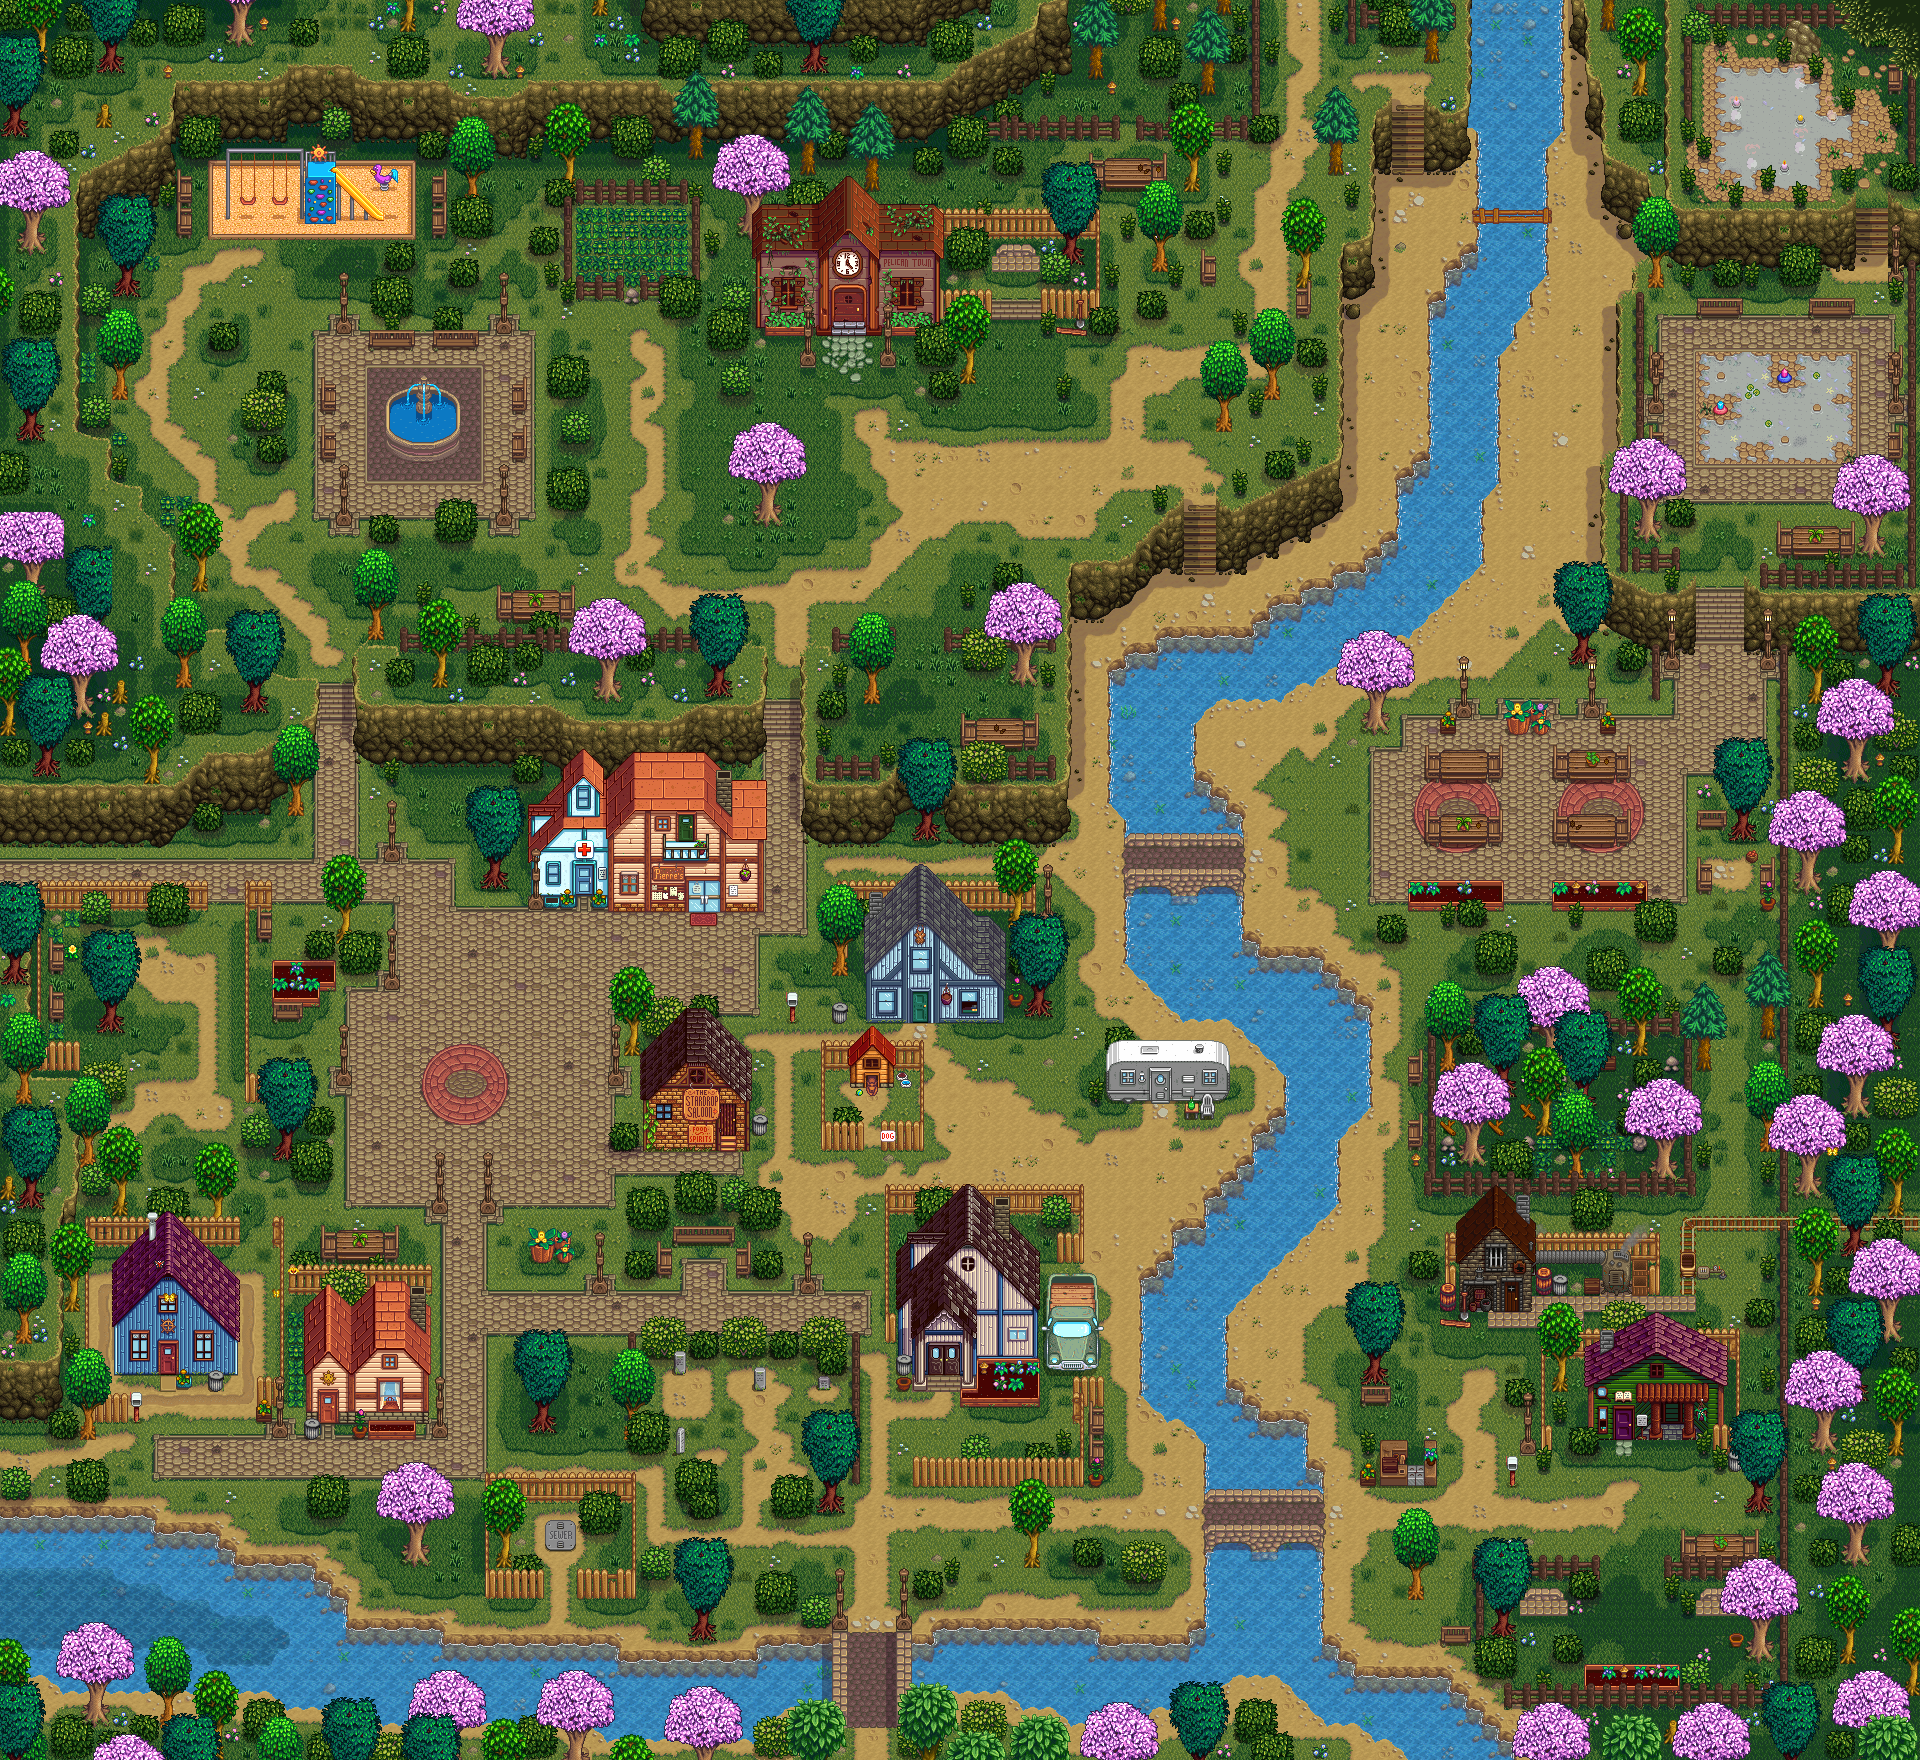 Immersive Map Redits とび森 マイデザイン 地面 どうぶつの森